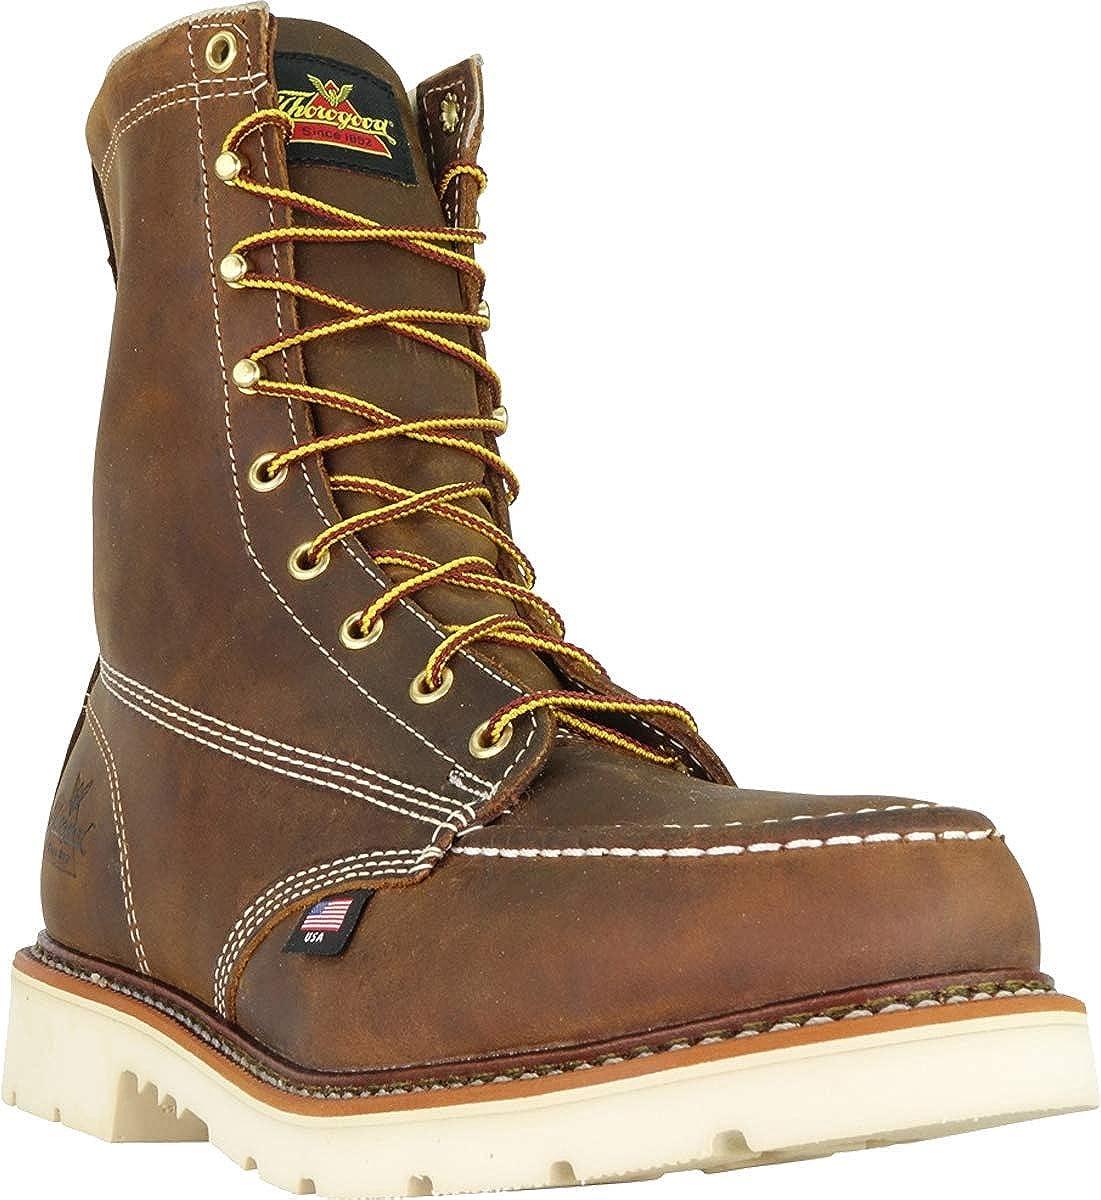 MAXWear 90 Safety Toe Boot Thorogood Mens American Heritage 8 Moc Toe